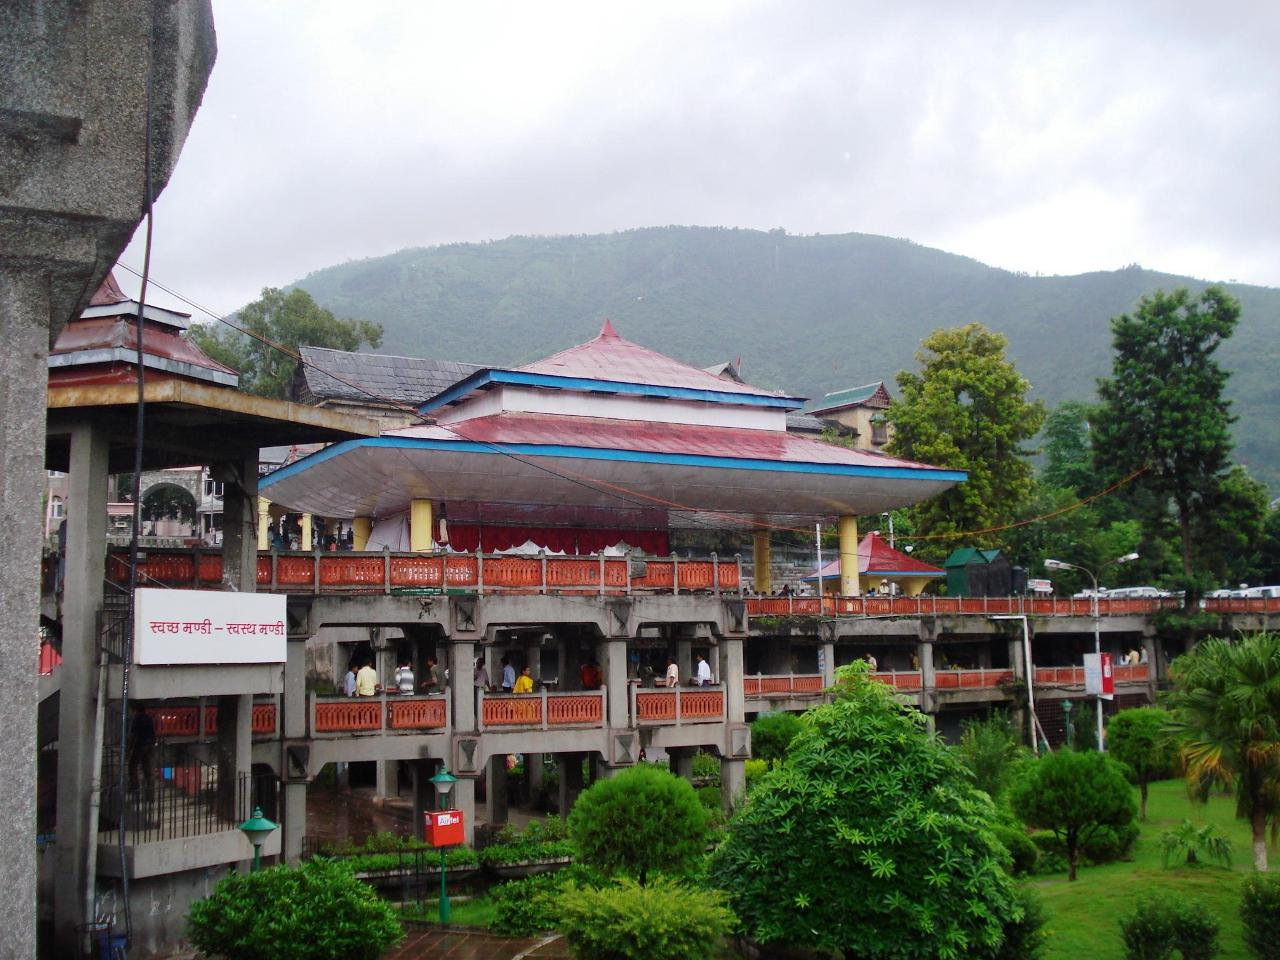 Backside View Of Seri Manch, Mandi